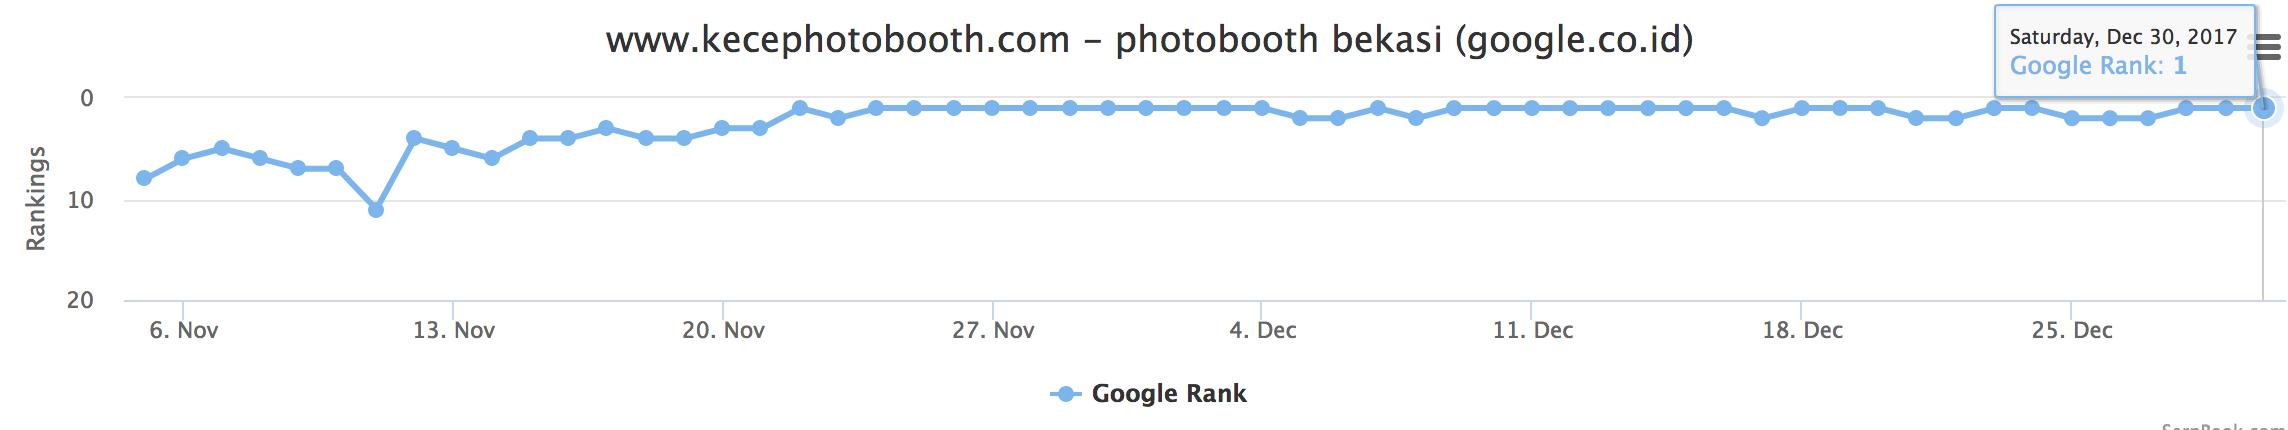 kecephotobooth-photobooth-bekasi